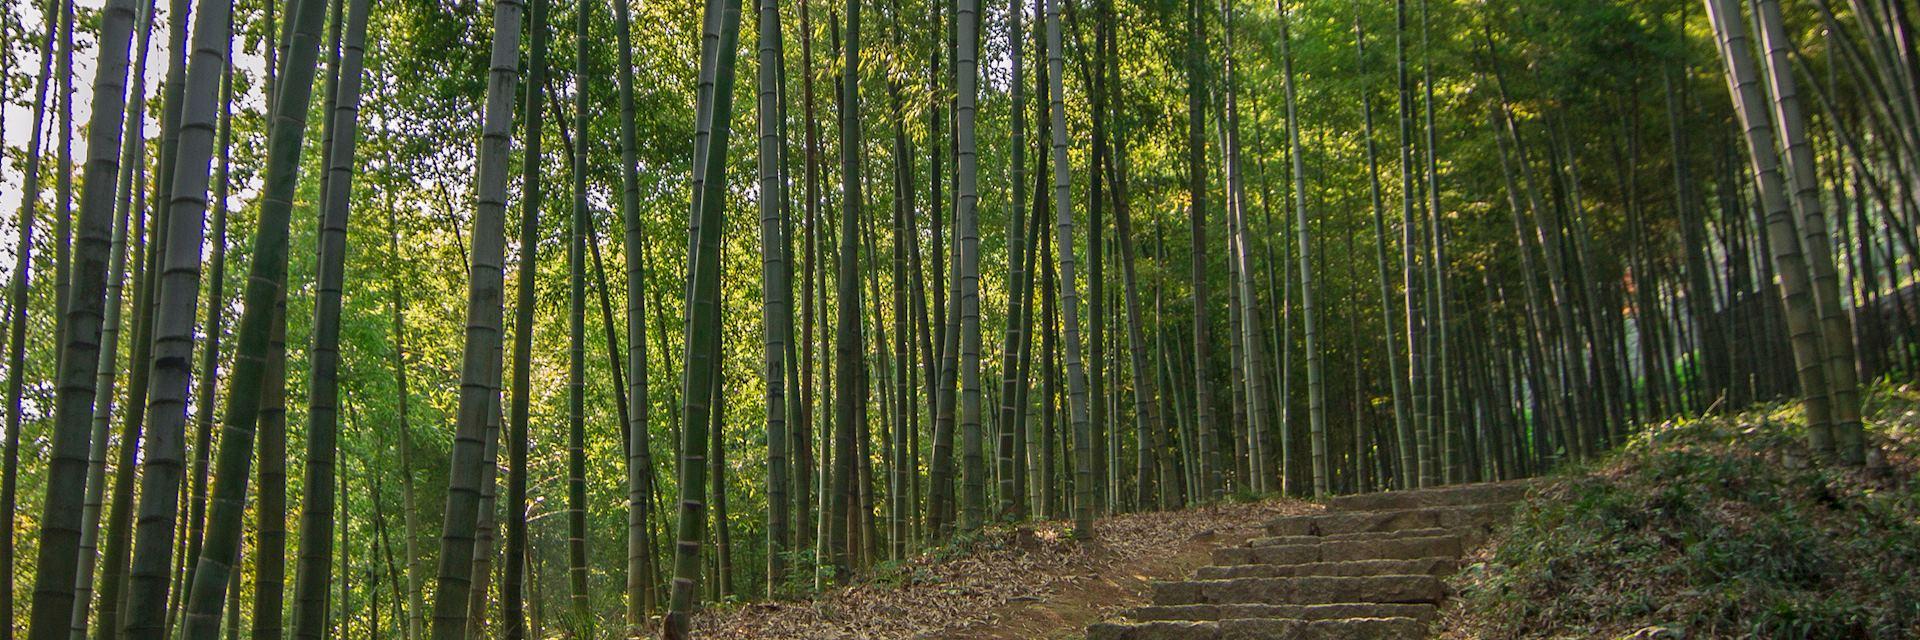 Bamboo forest, Moganshan